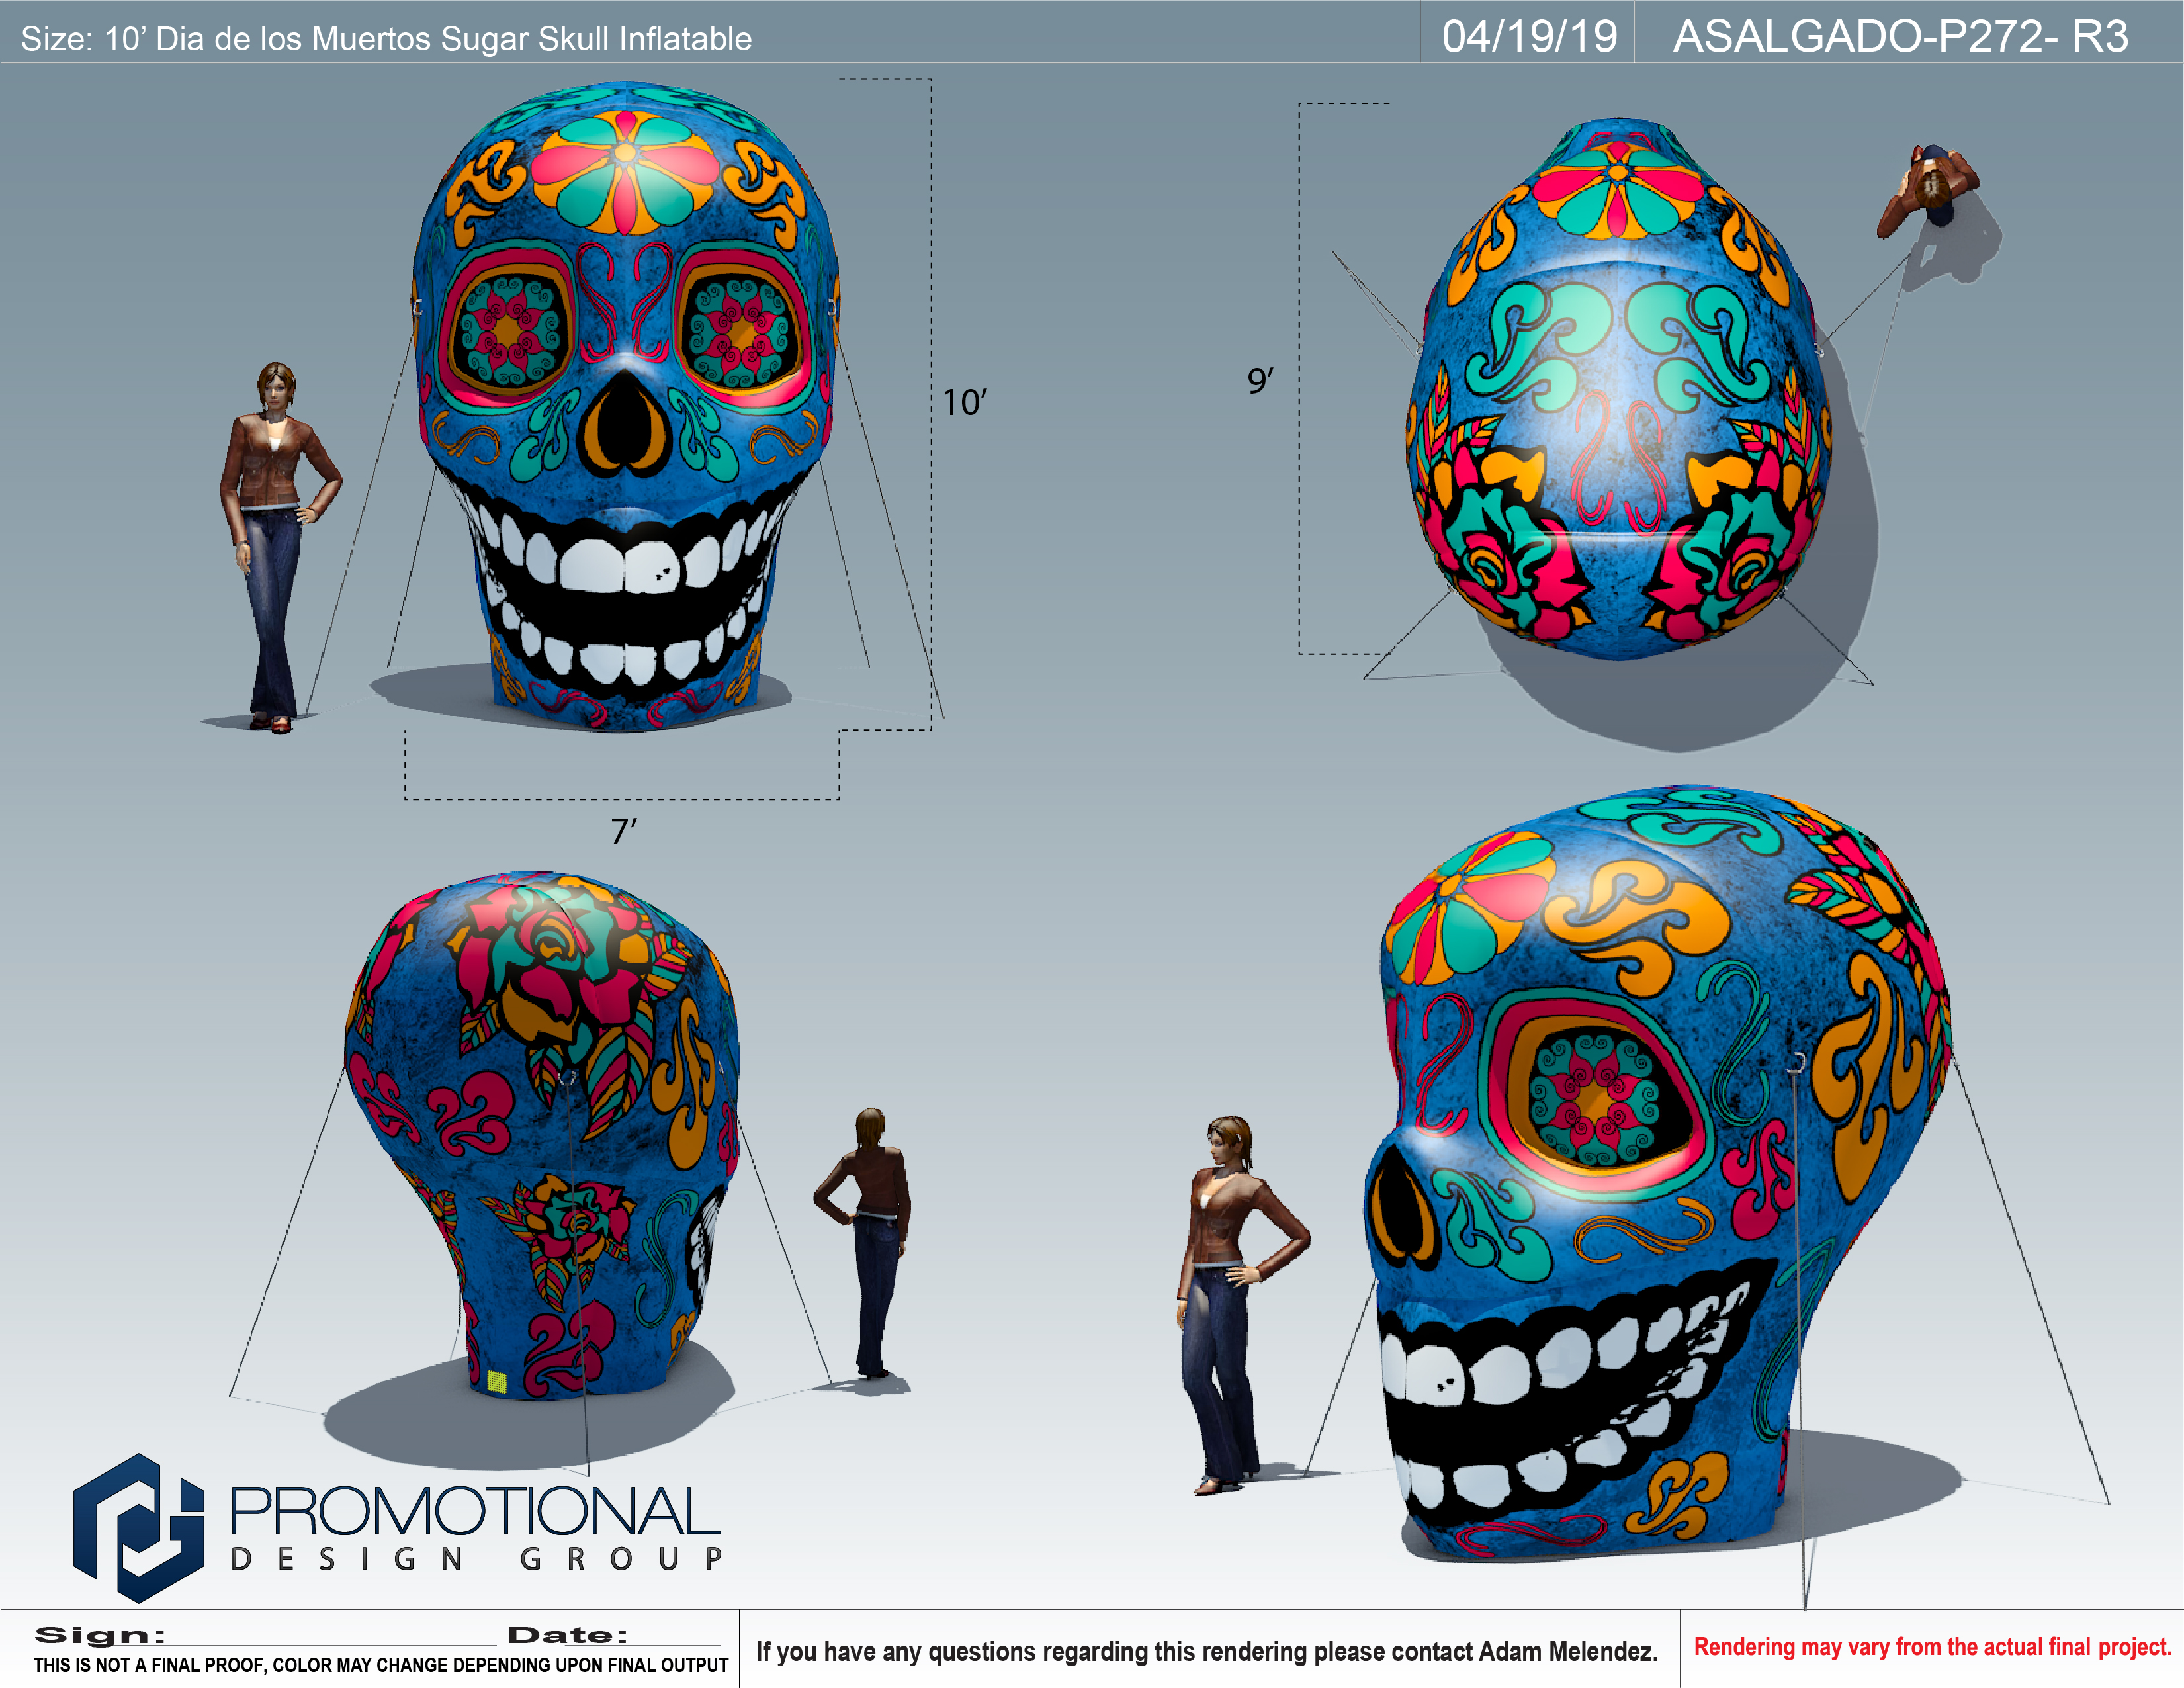 colorful-sugar-skull